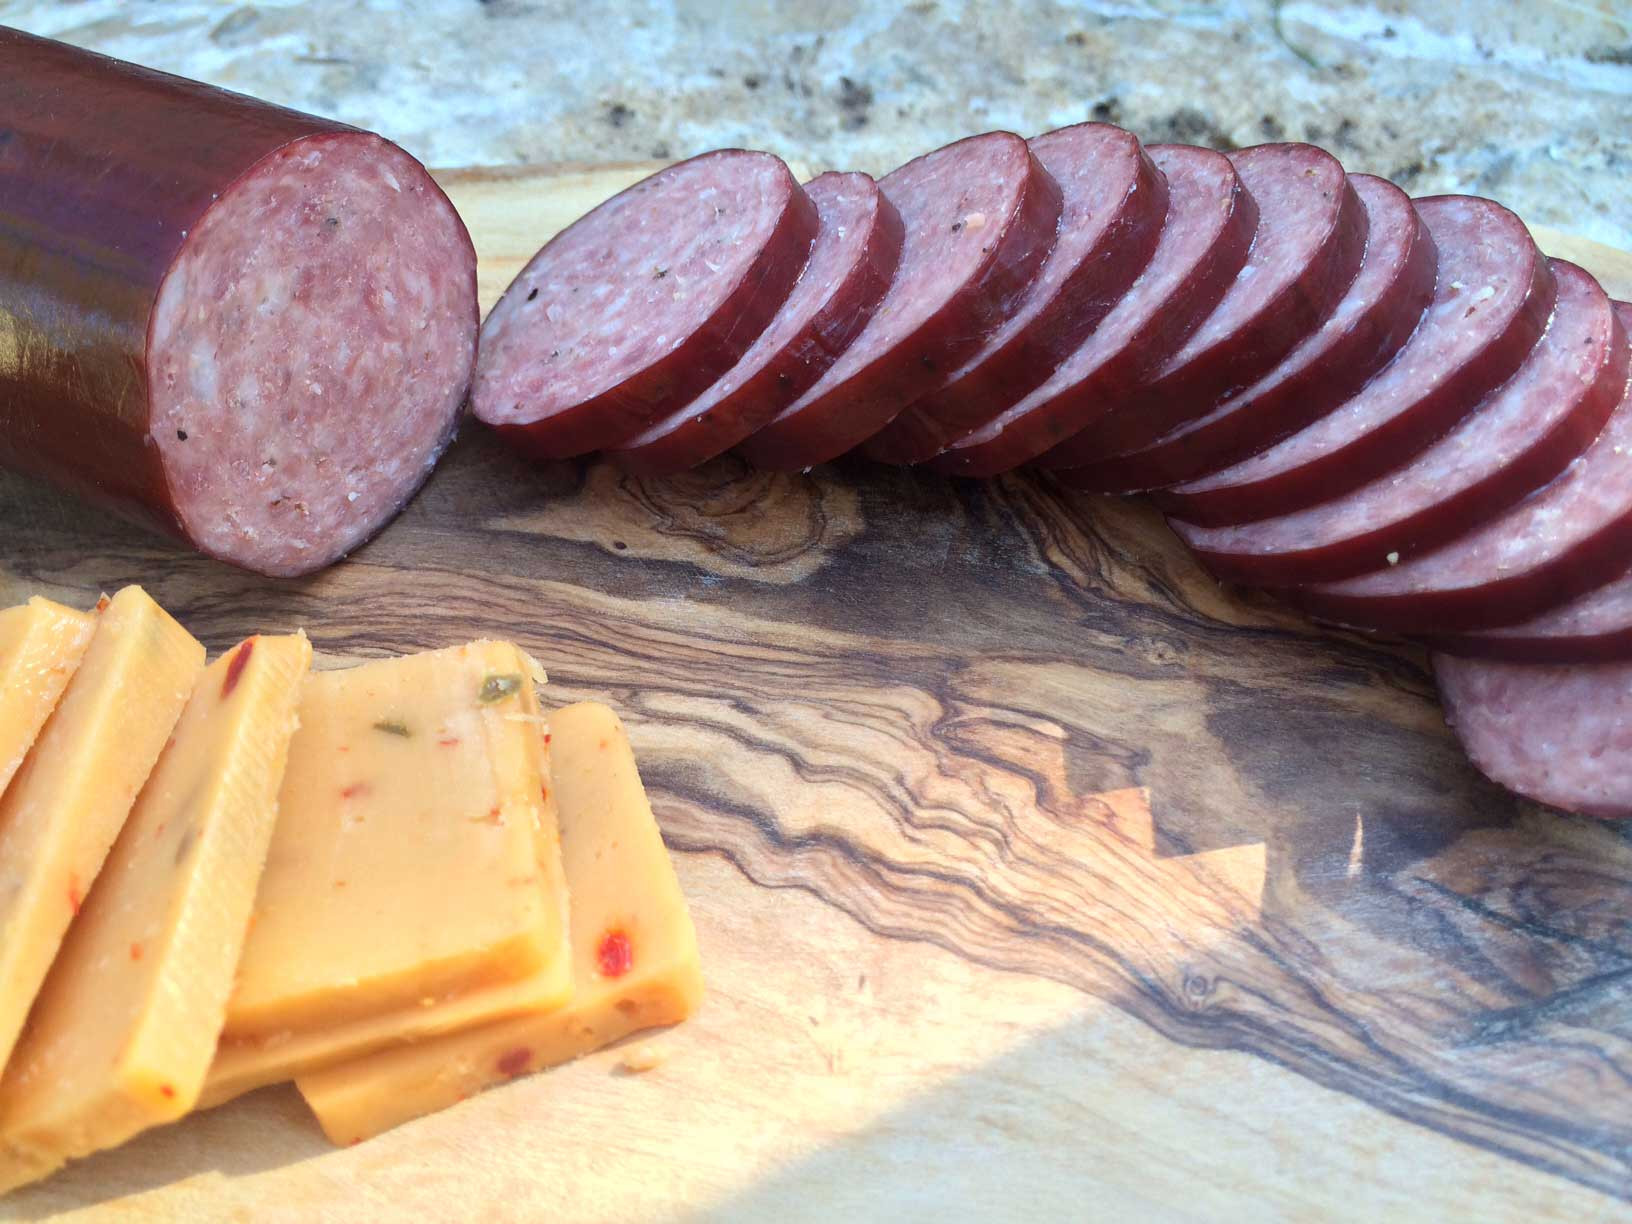 Venison Summer Sausage Recipes For Smoker  Elk Hickory Smoked Summer Sausage